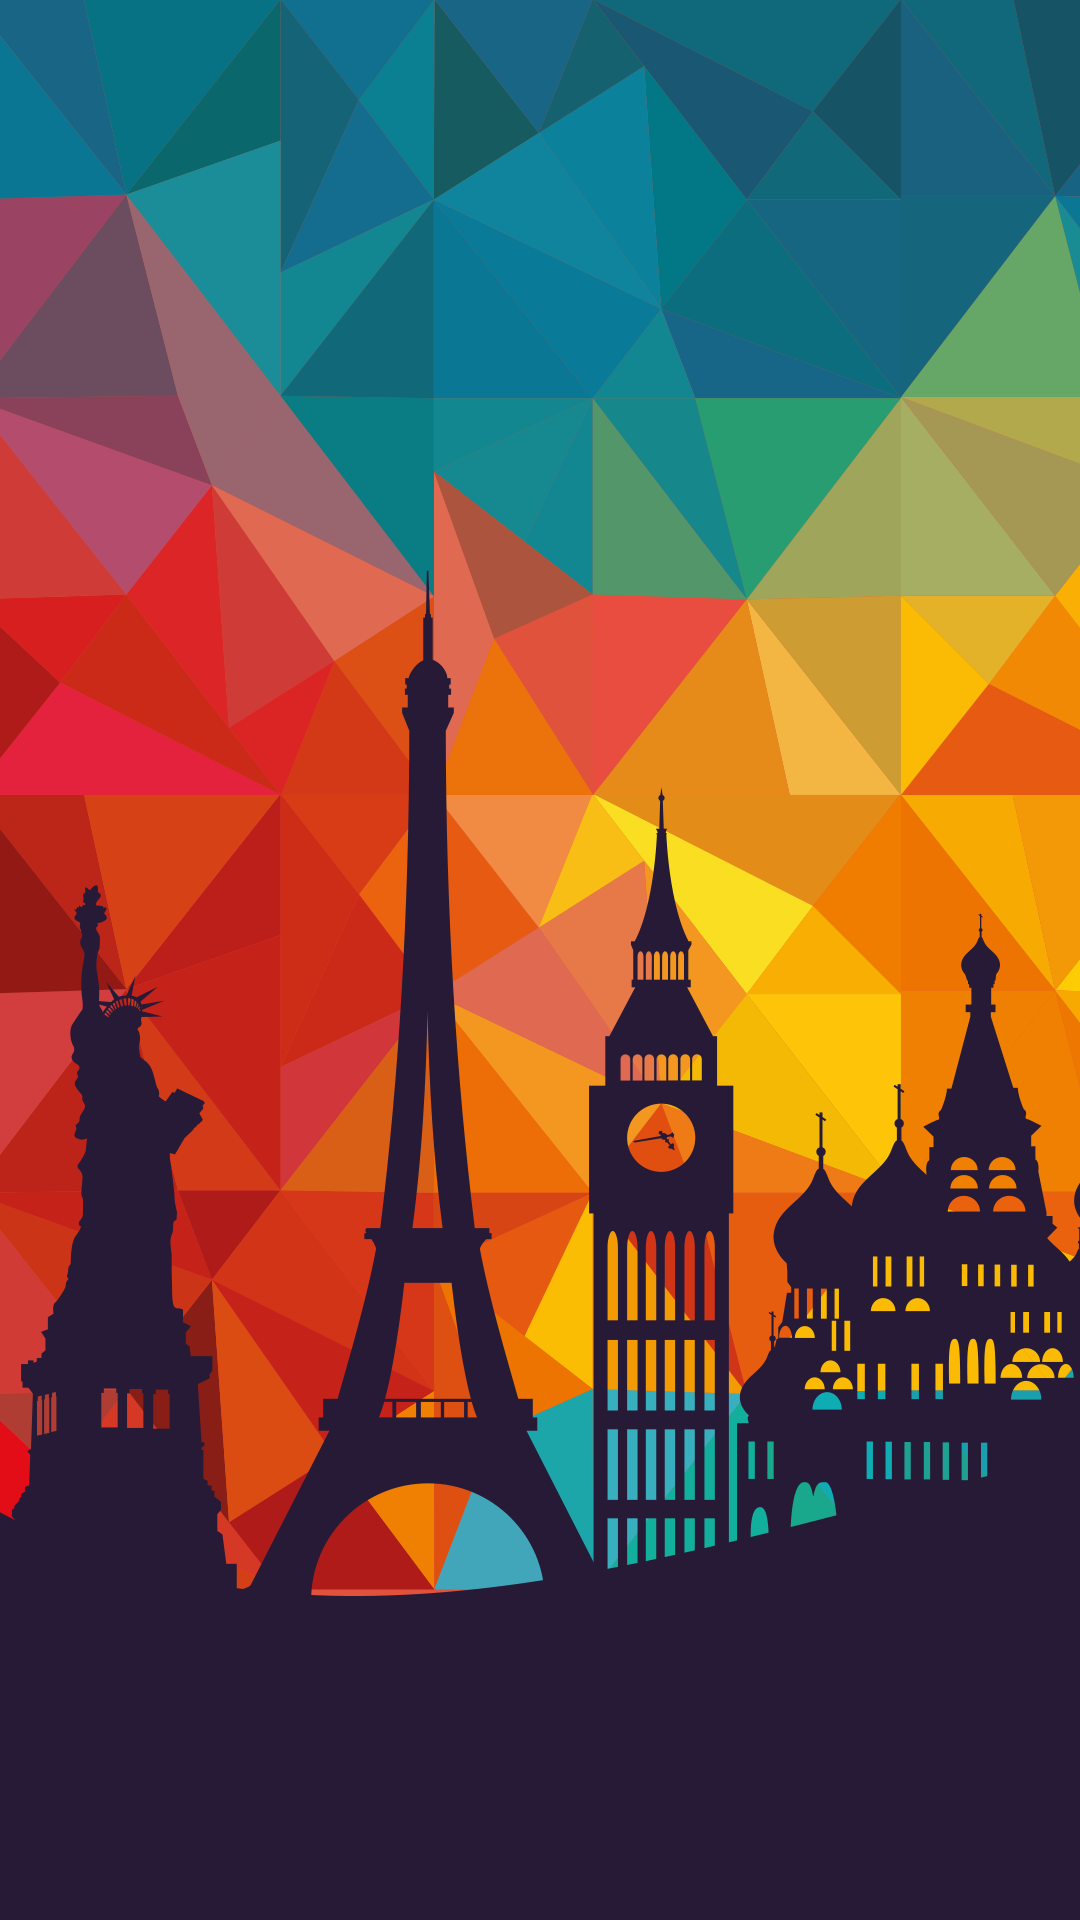 Iphone wallpaper london tumblr - Multicolor City Paris London New York Travel Hd Iphone 6 Wallpaper